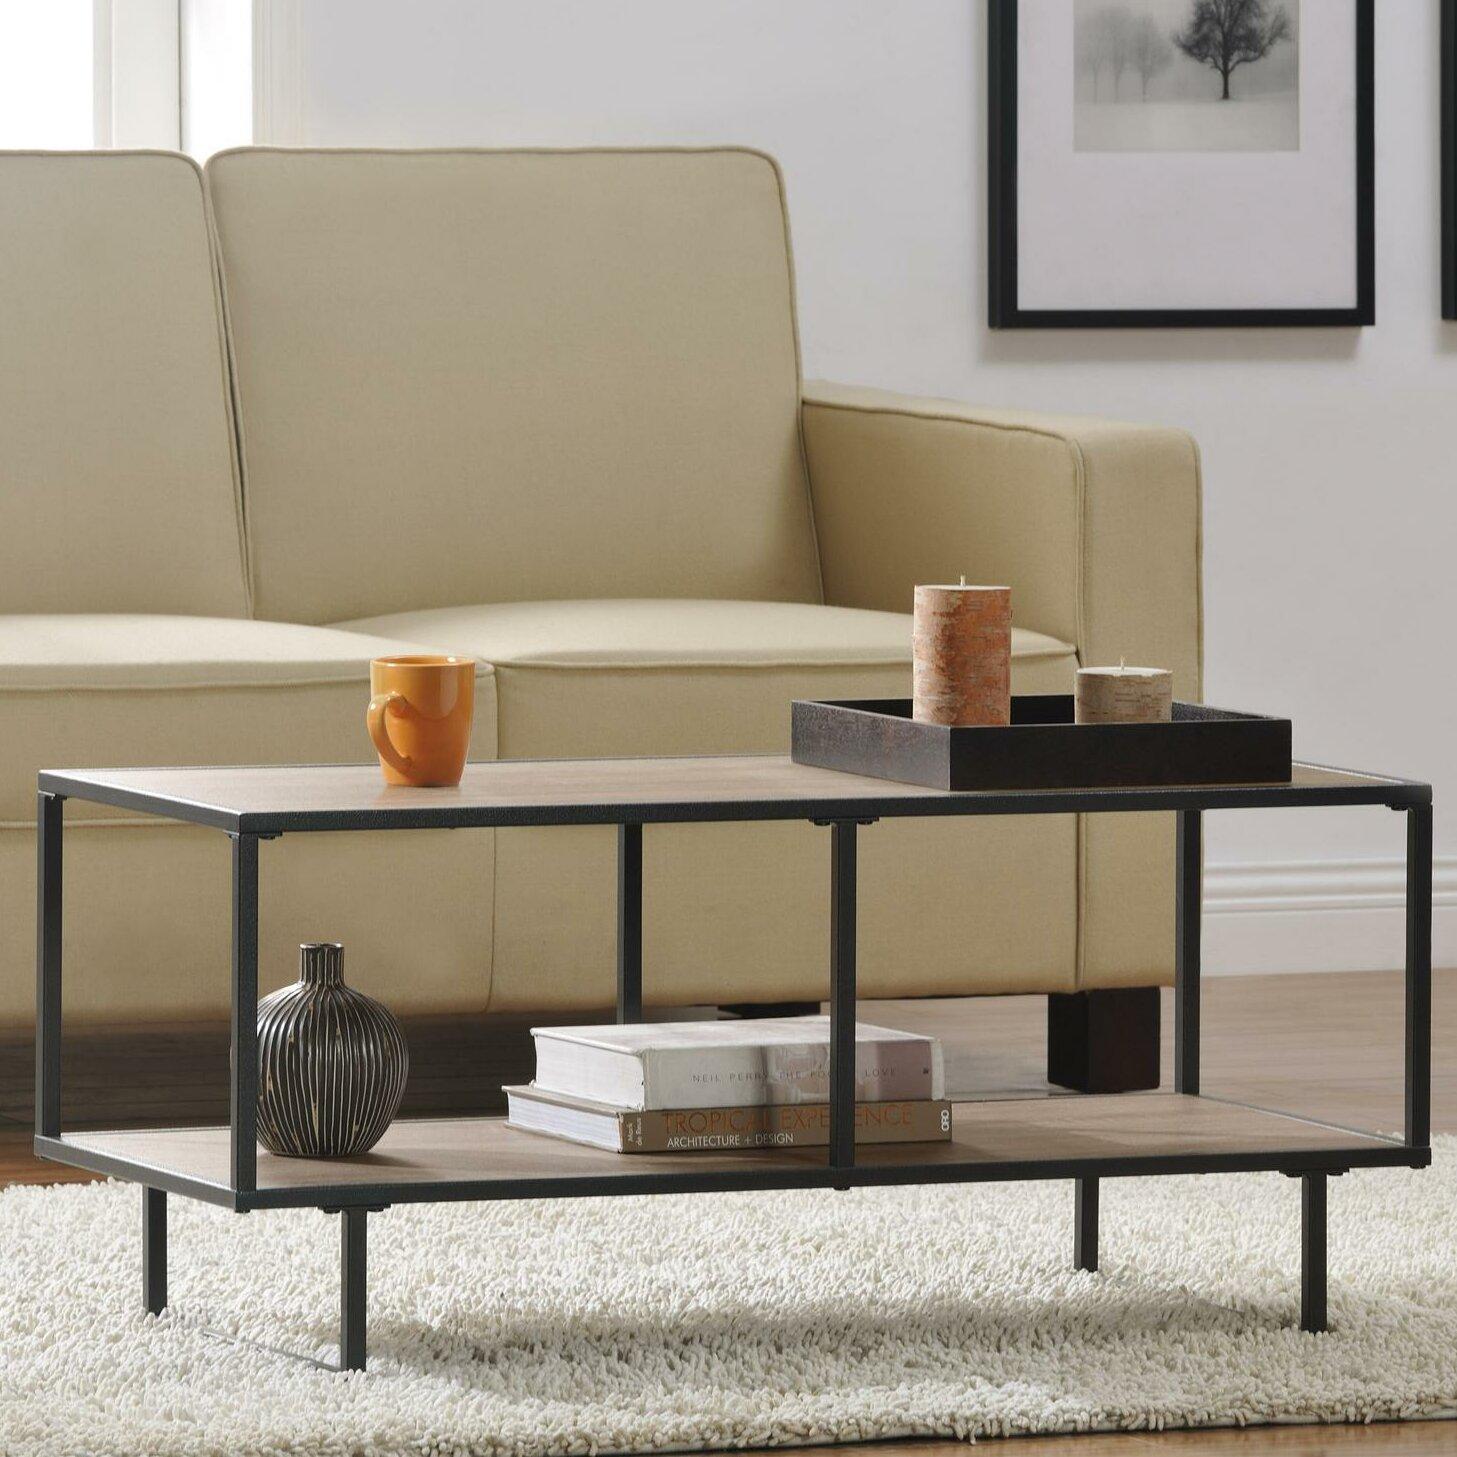 Modern Farmhouse Coffee Table: Laurel Foundry Modern Farmhouse Zenaida Coffee Table